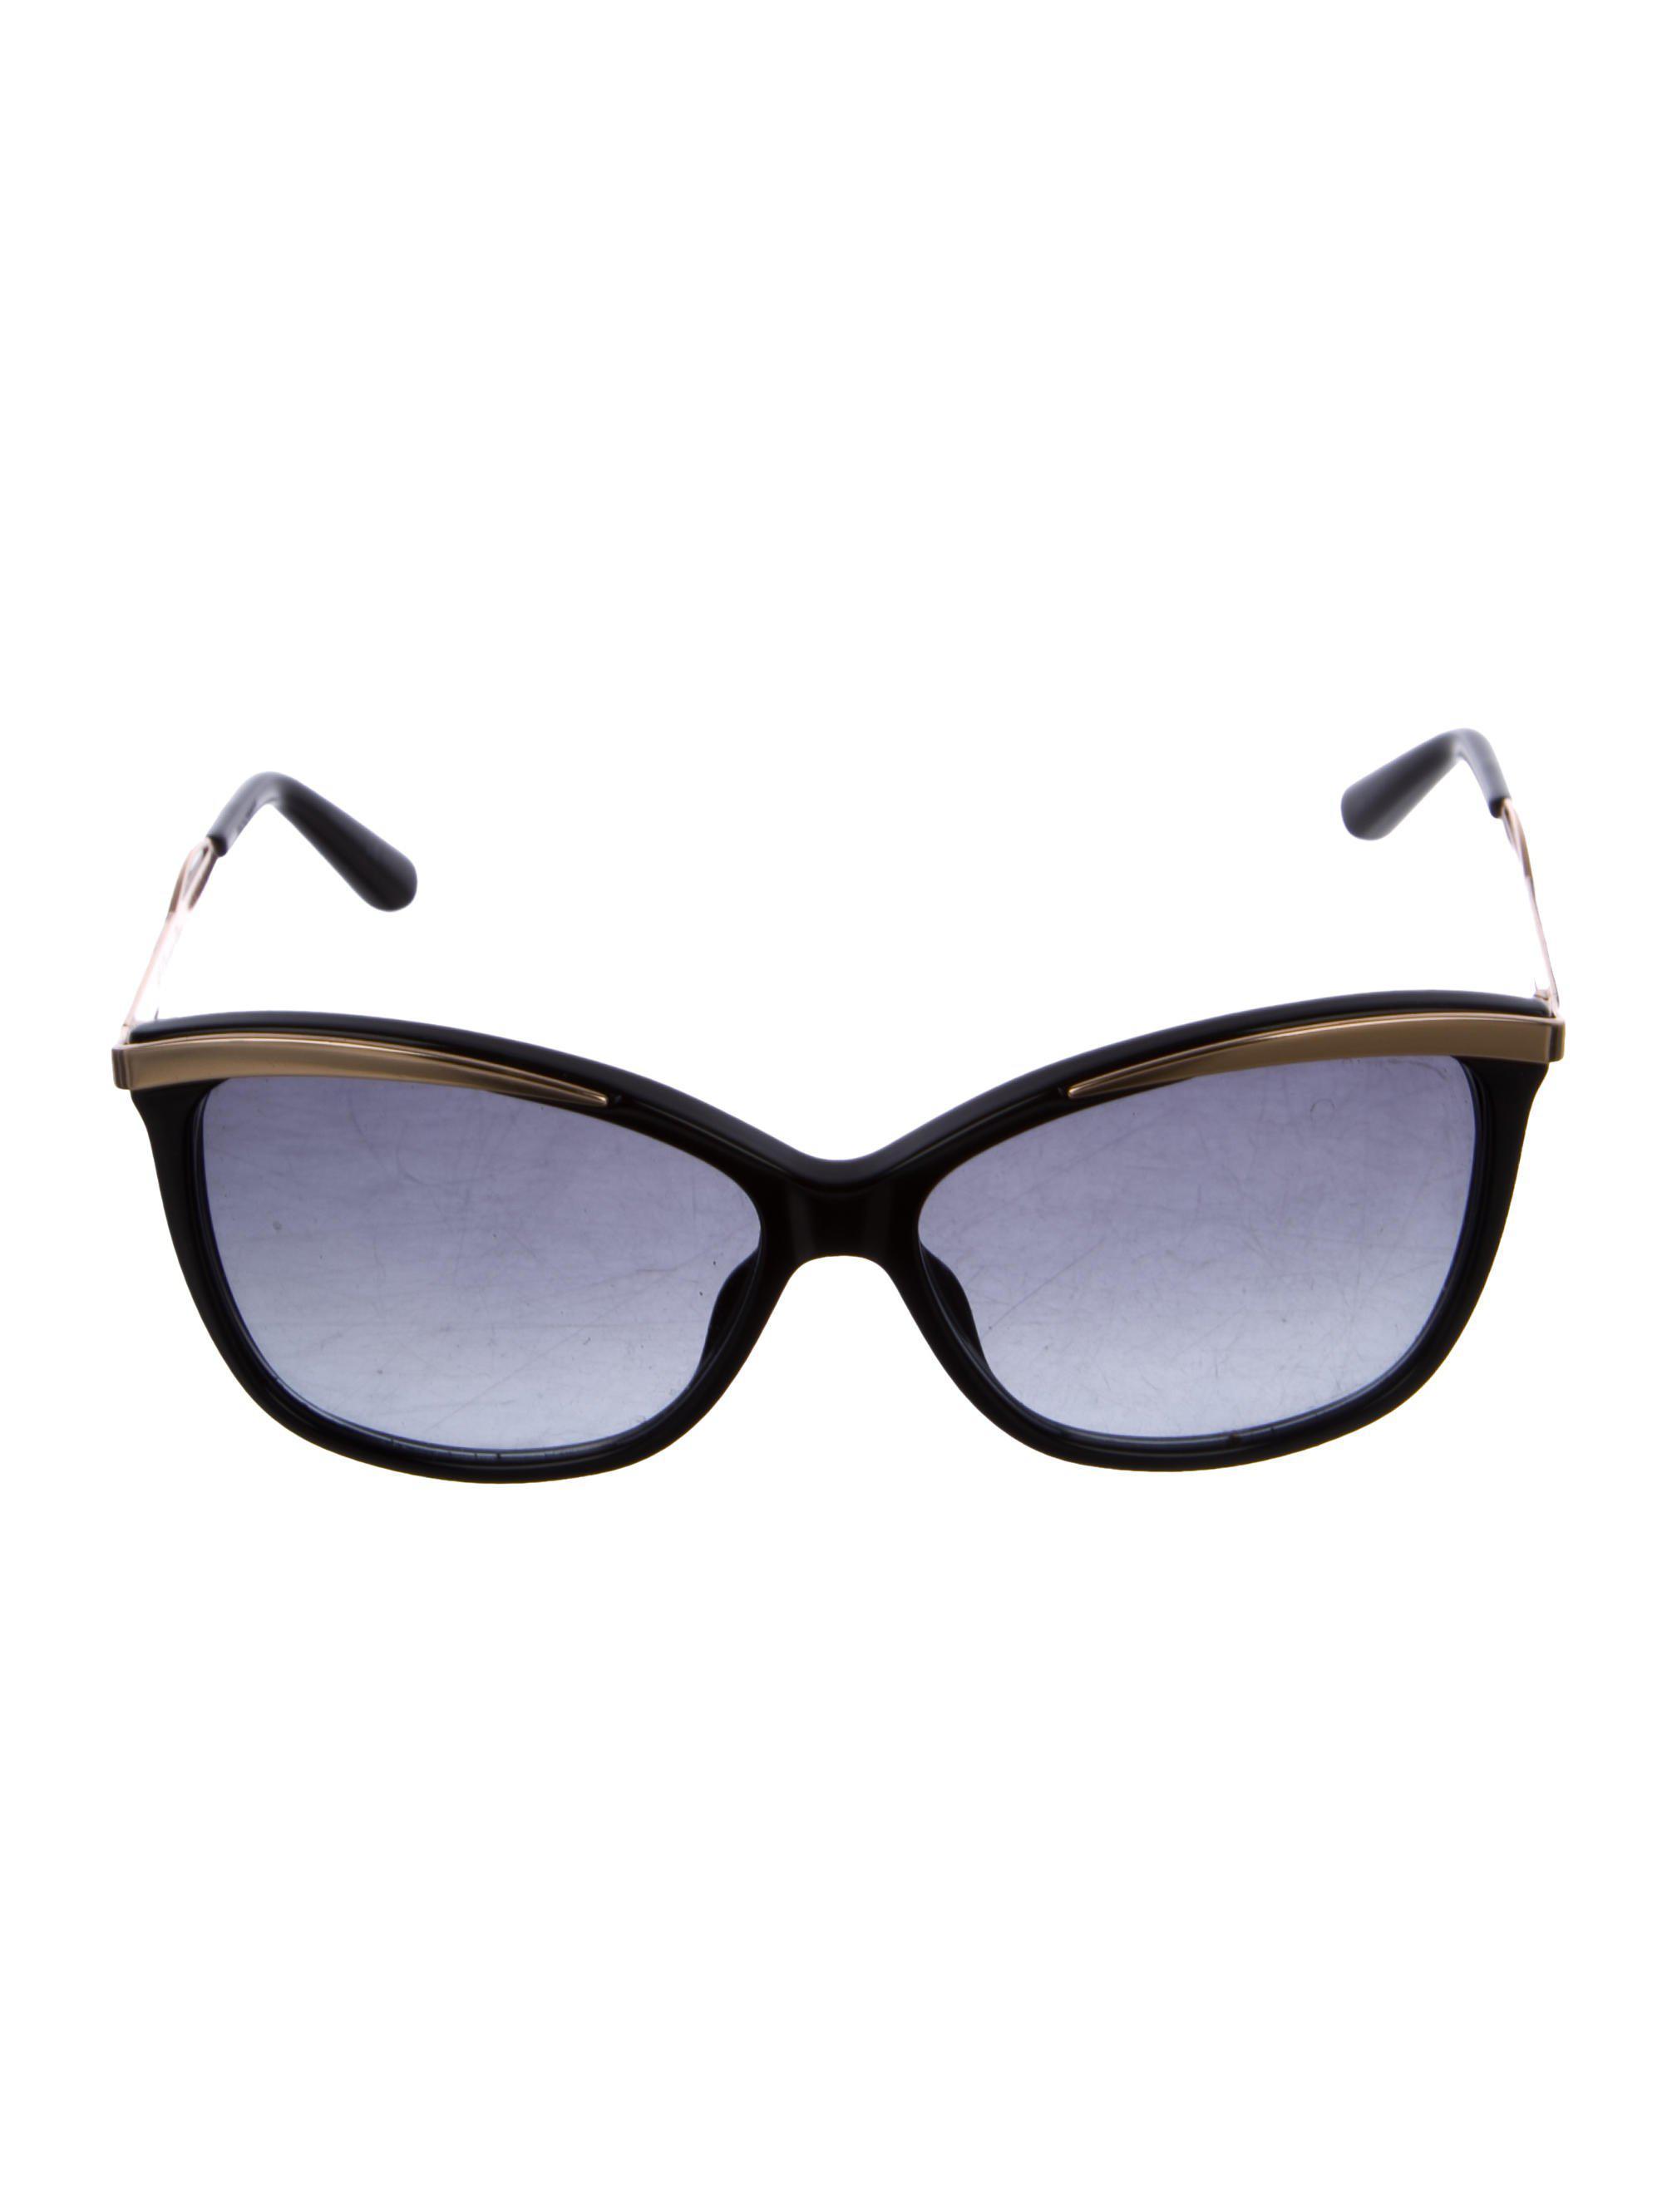 2d7bbb4c2052 Lyst - Dior Metaleyes 2 Sunglasses Black in Metallic